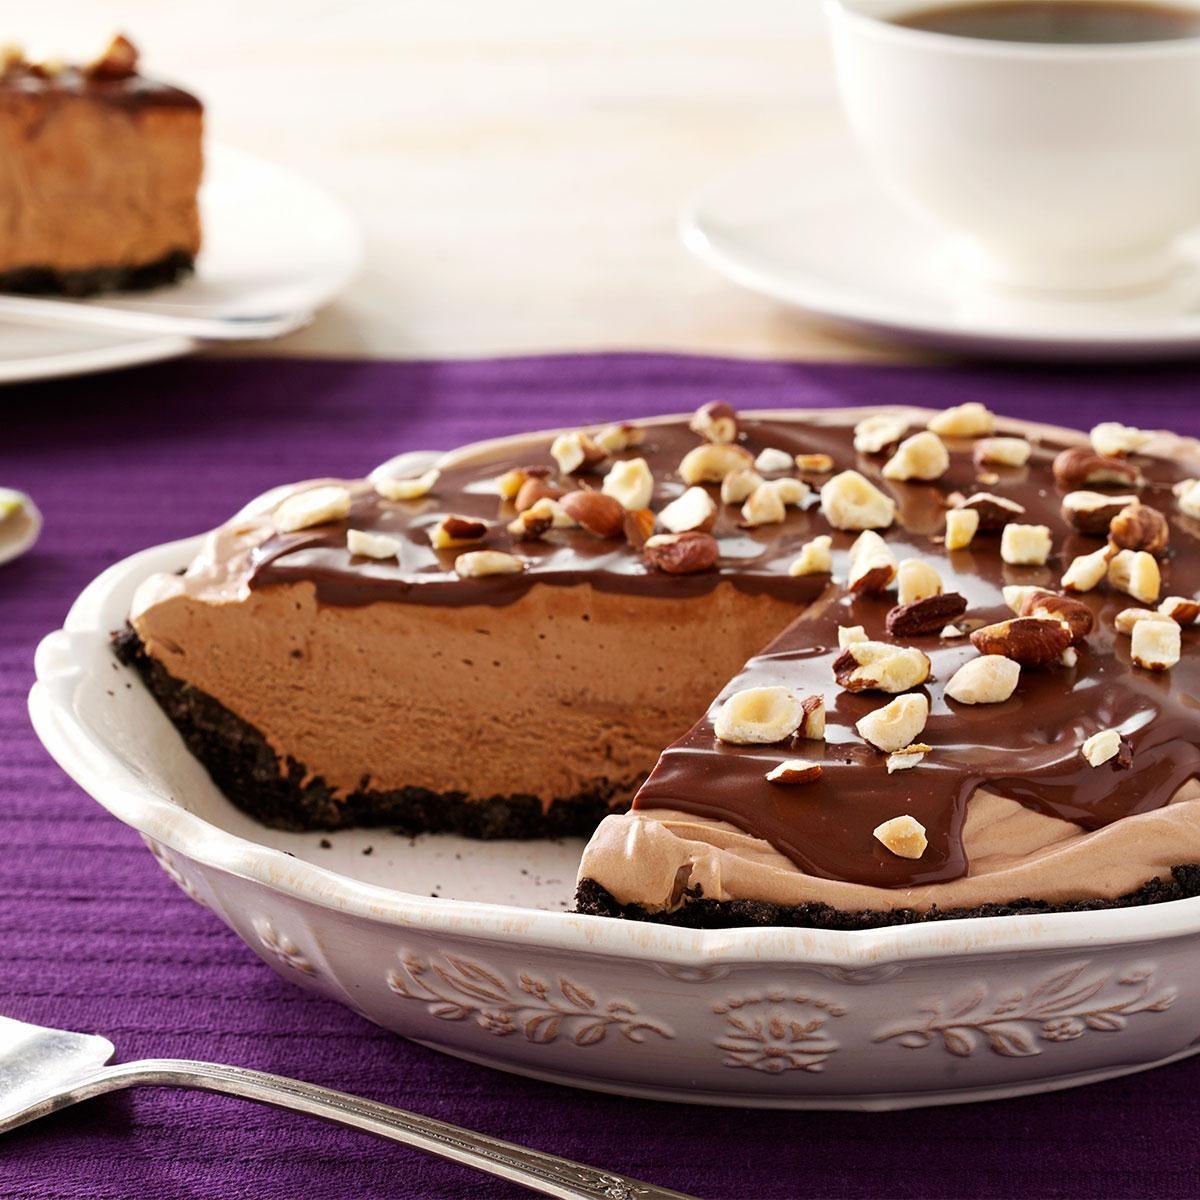 Chocolate-Hazelnut Cream Pie Recipe